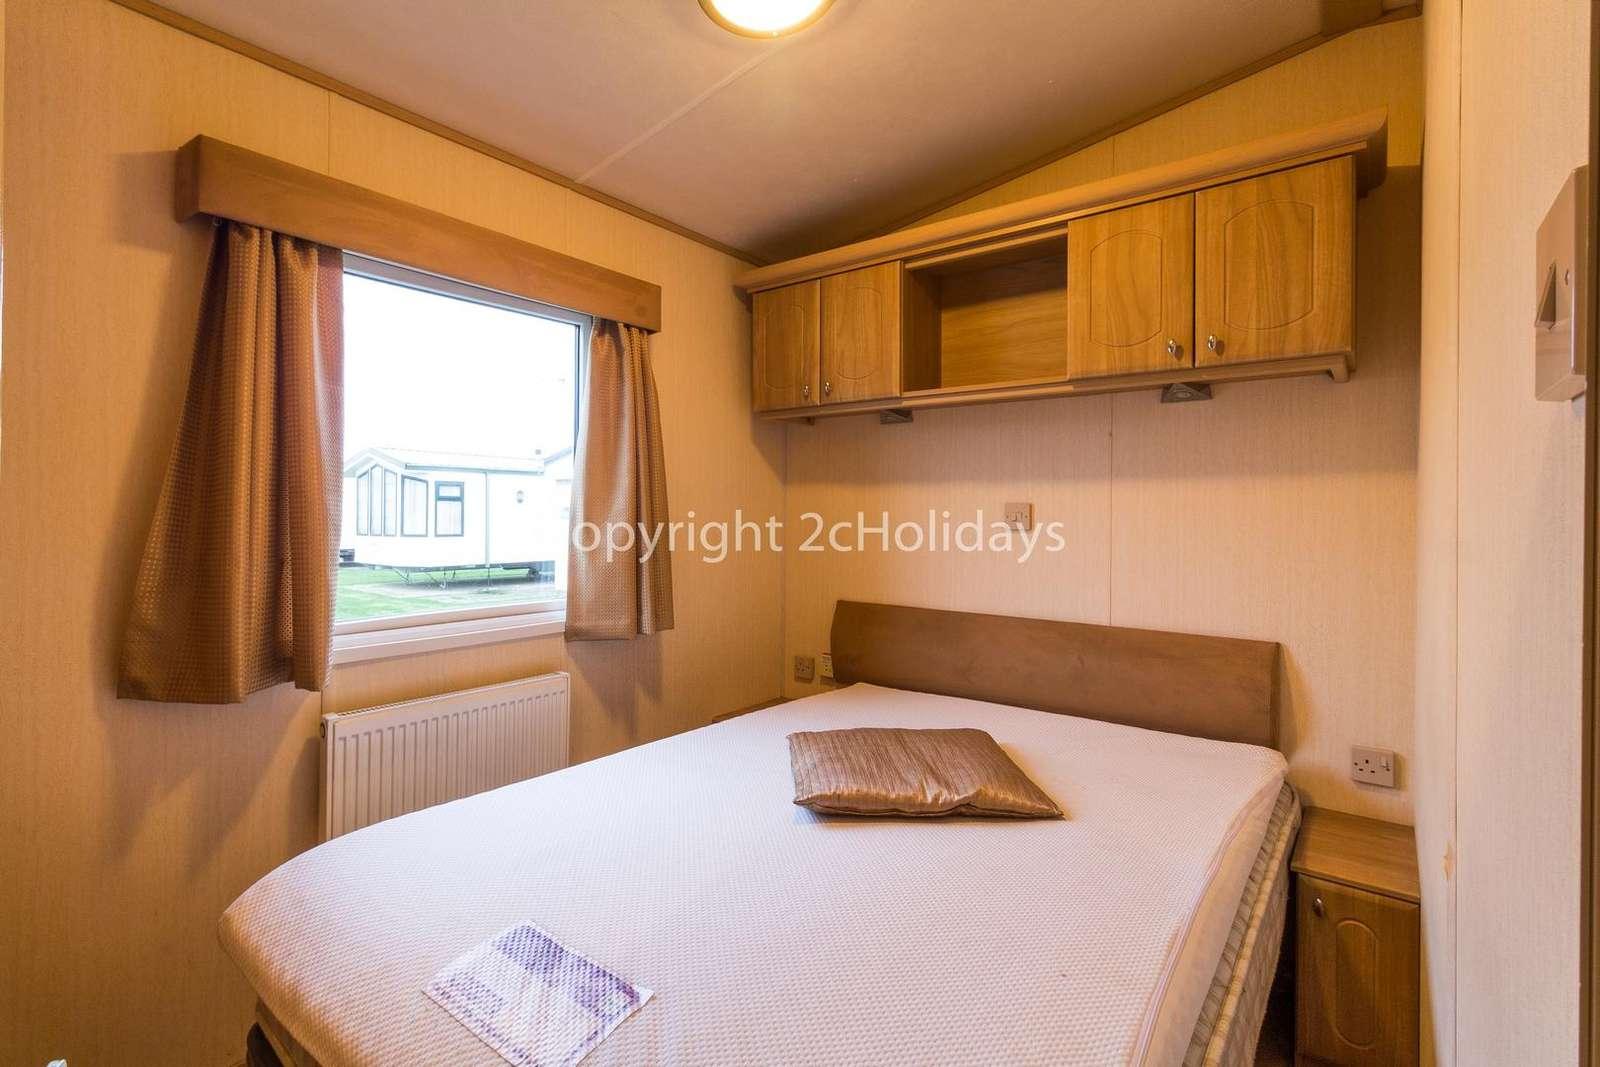 Coastal accommodation is Scratby